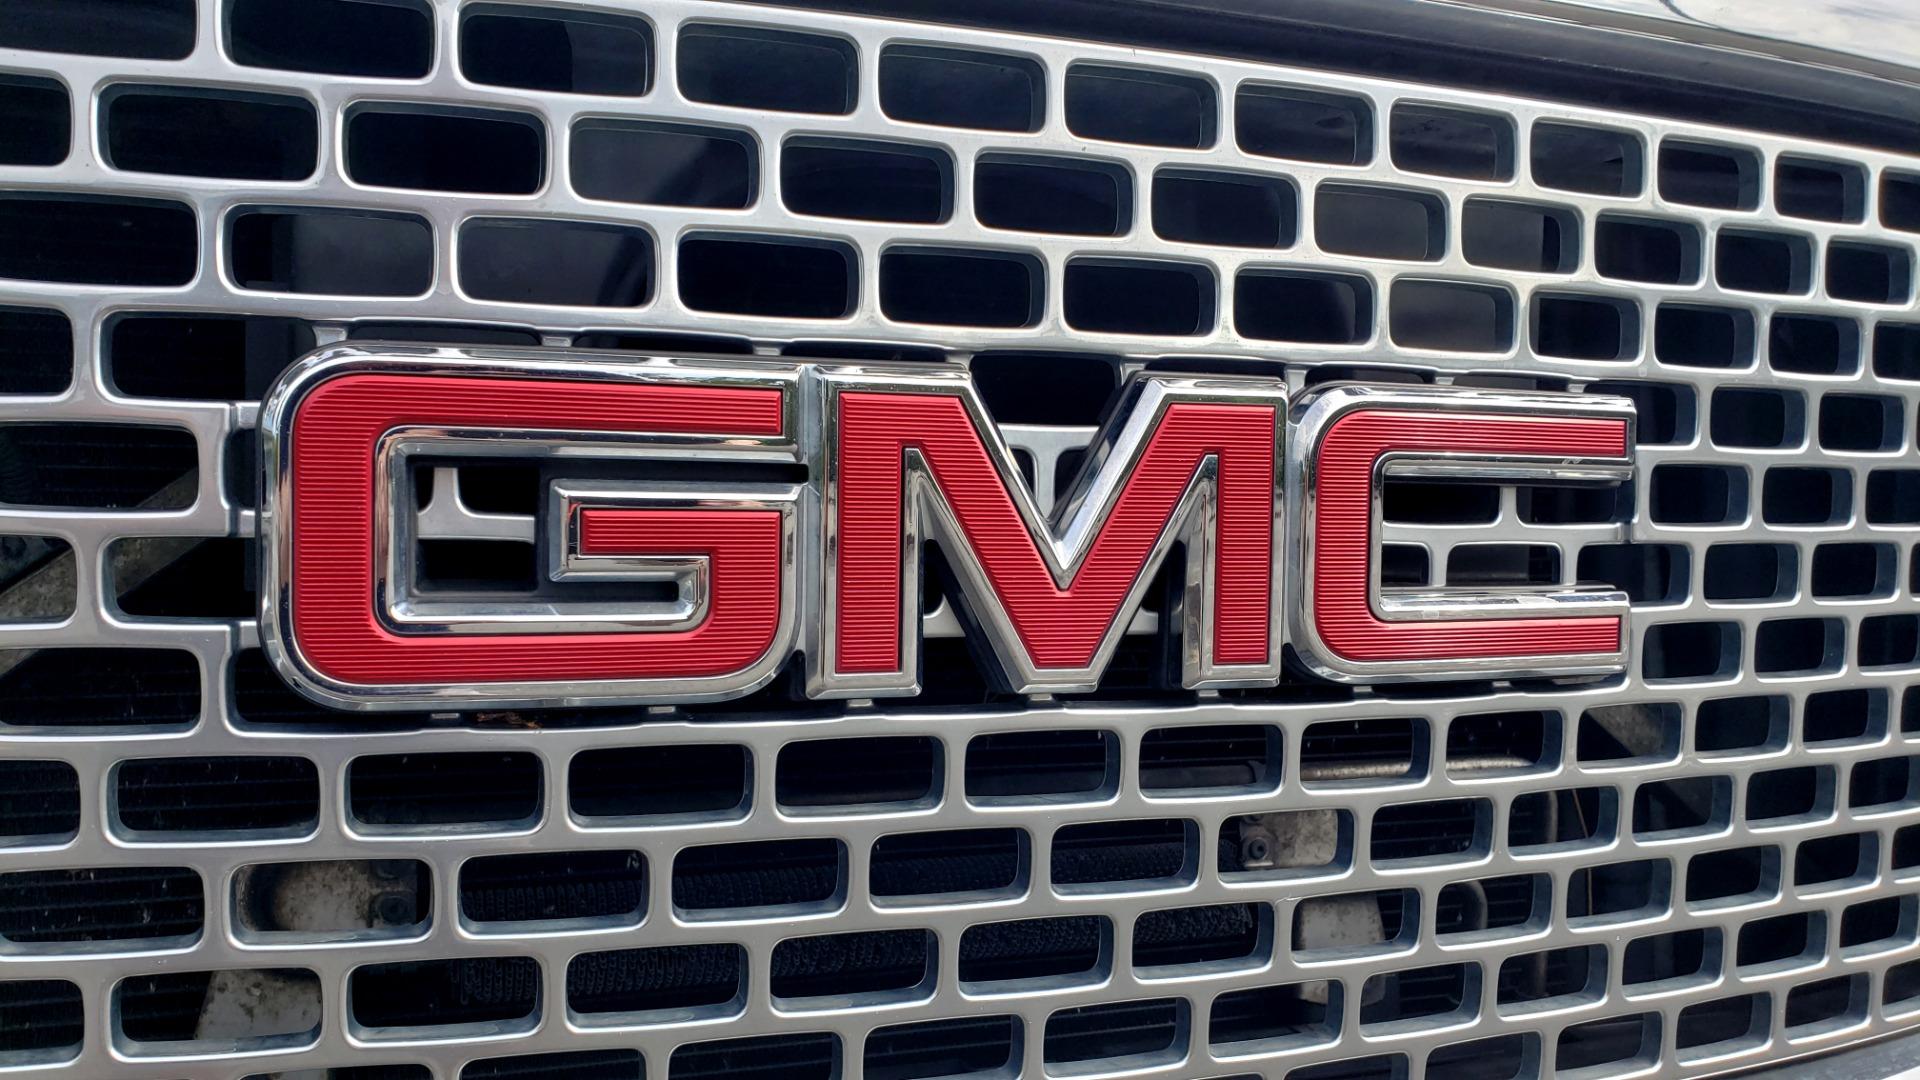 Used 2015 GMC SIERRA 2500HD DENALI / WIFI / NAV / DURAMAX PLUS / DRVR ALERT / SUNROOF / REARVIEW for sale $56,995 at Formula Imports in Charlotte NC 28227 18